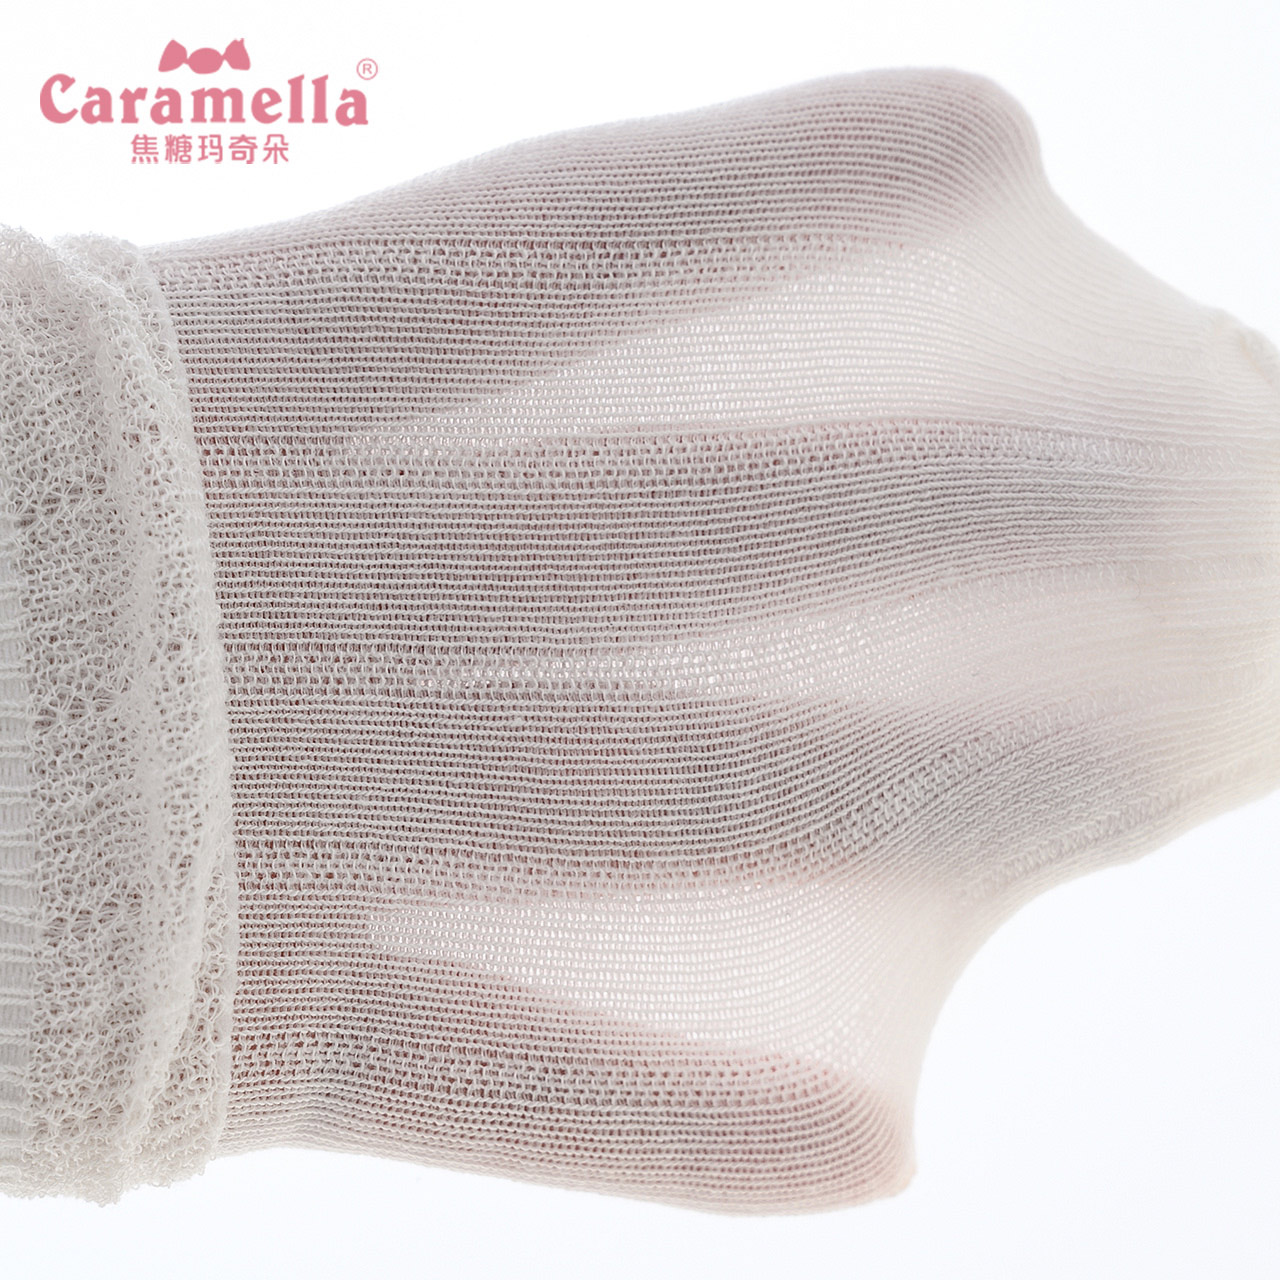 caramella 儿童袜子春秋薄款学院风宝宝袜子透气蕾丝女童白色短袜